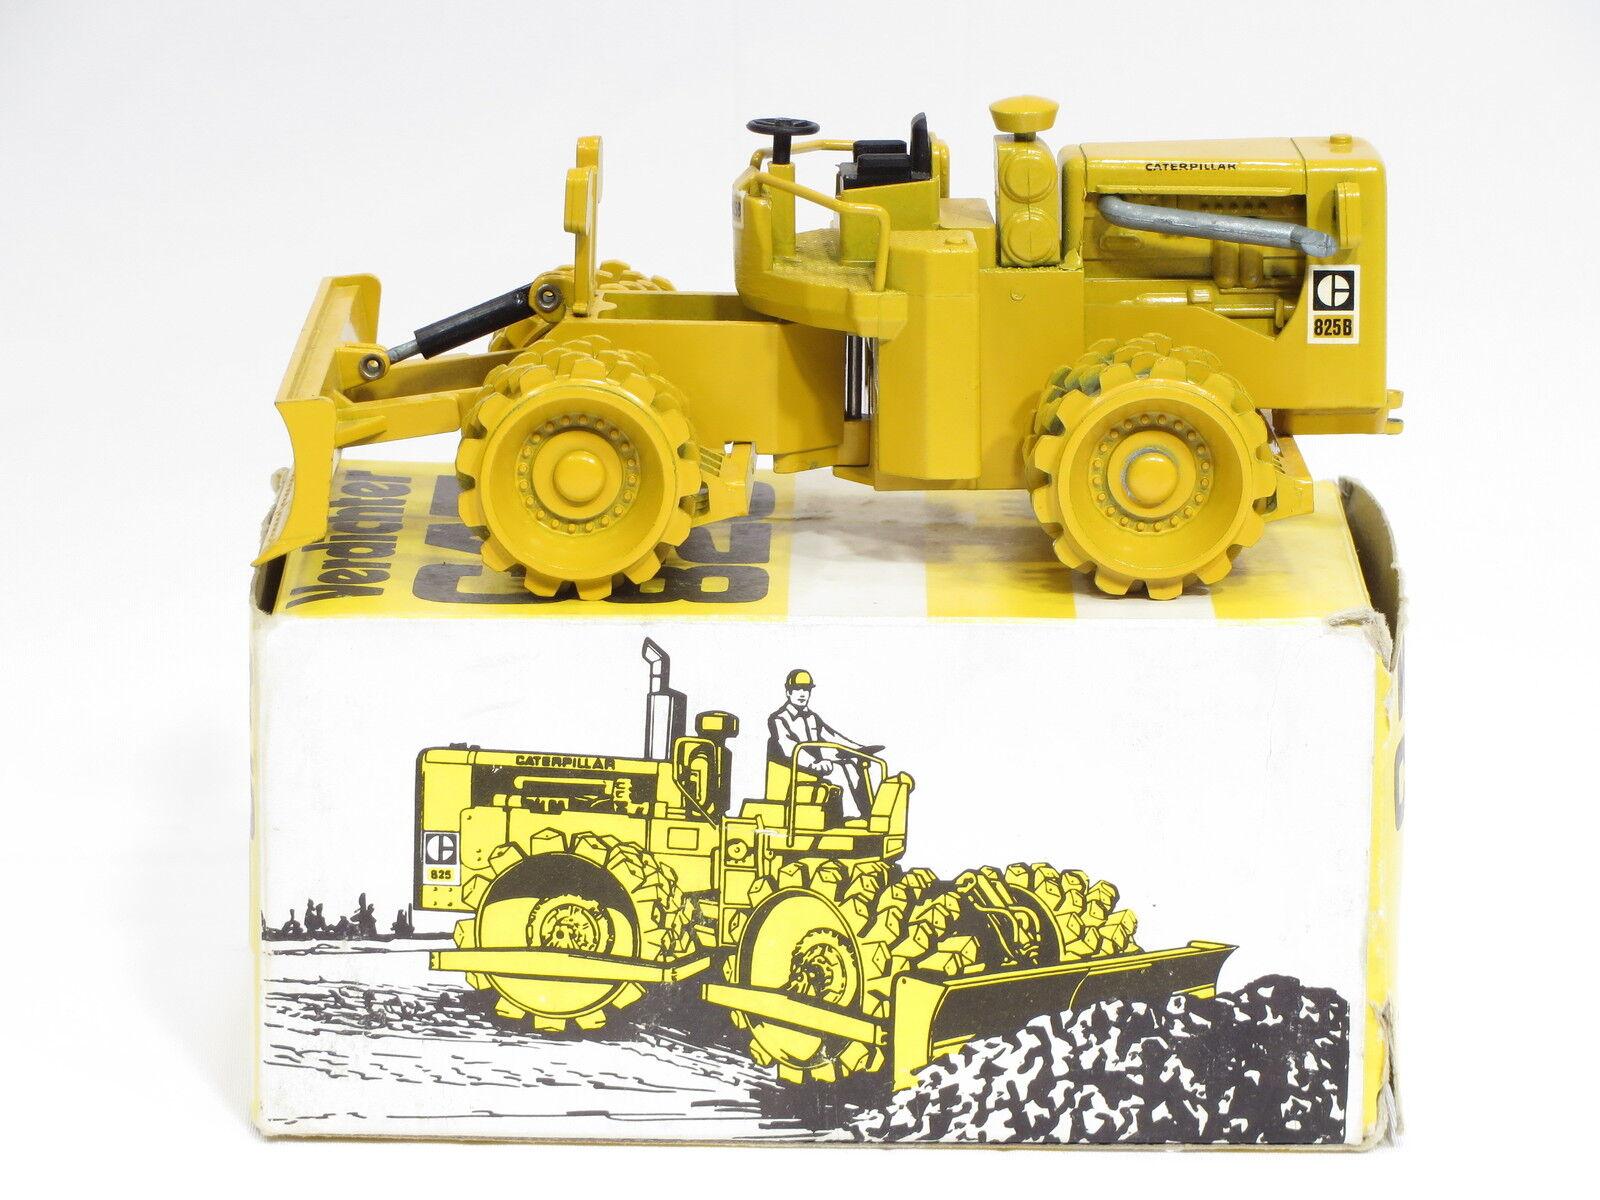 Caterpillar 825b Compactador - -Nzg  -n.mib